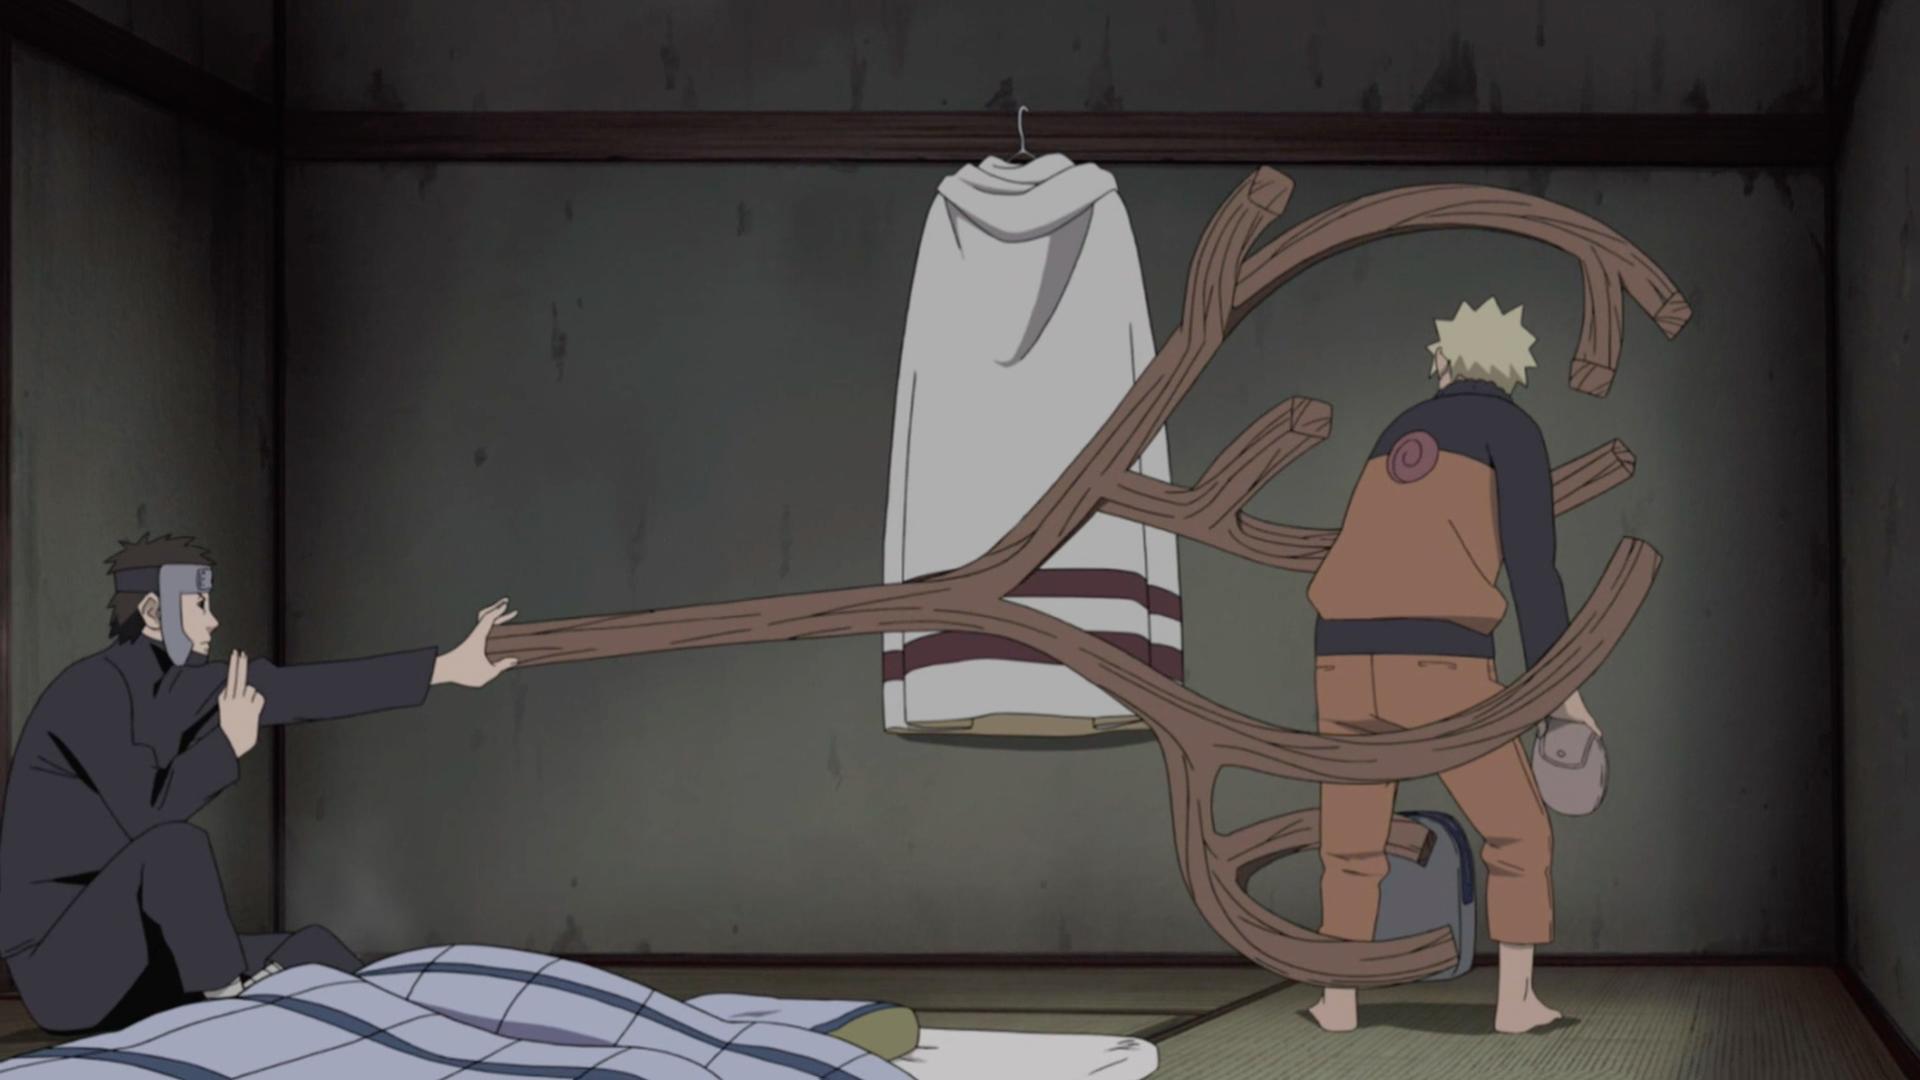 Naruto History And Descriptions: Yamato